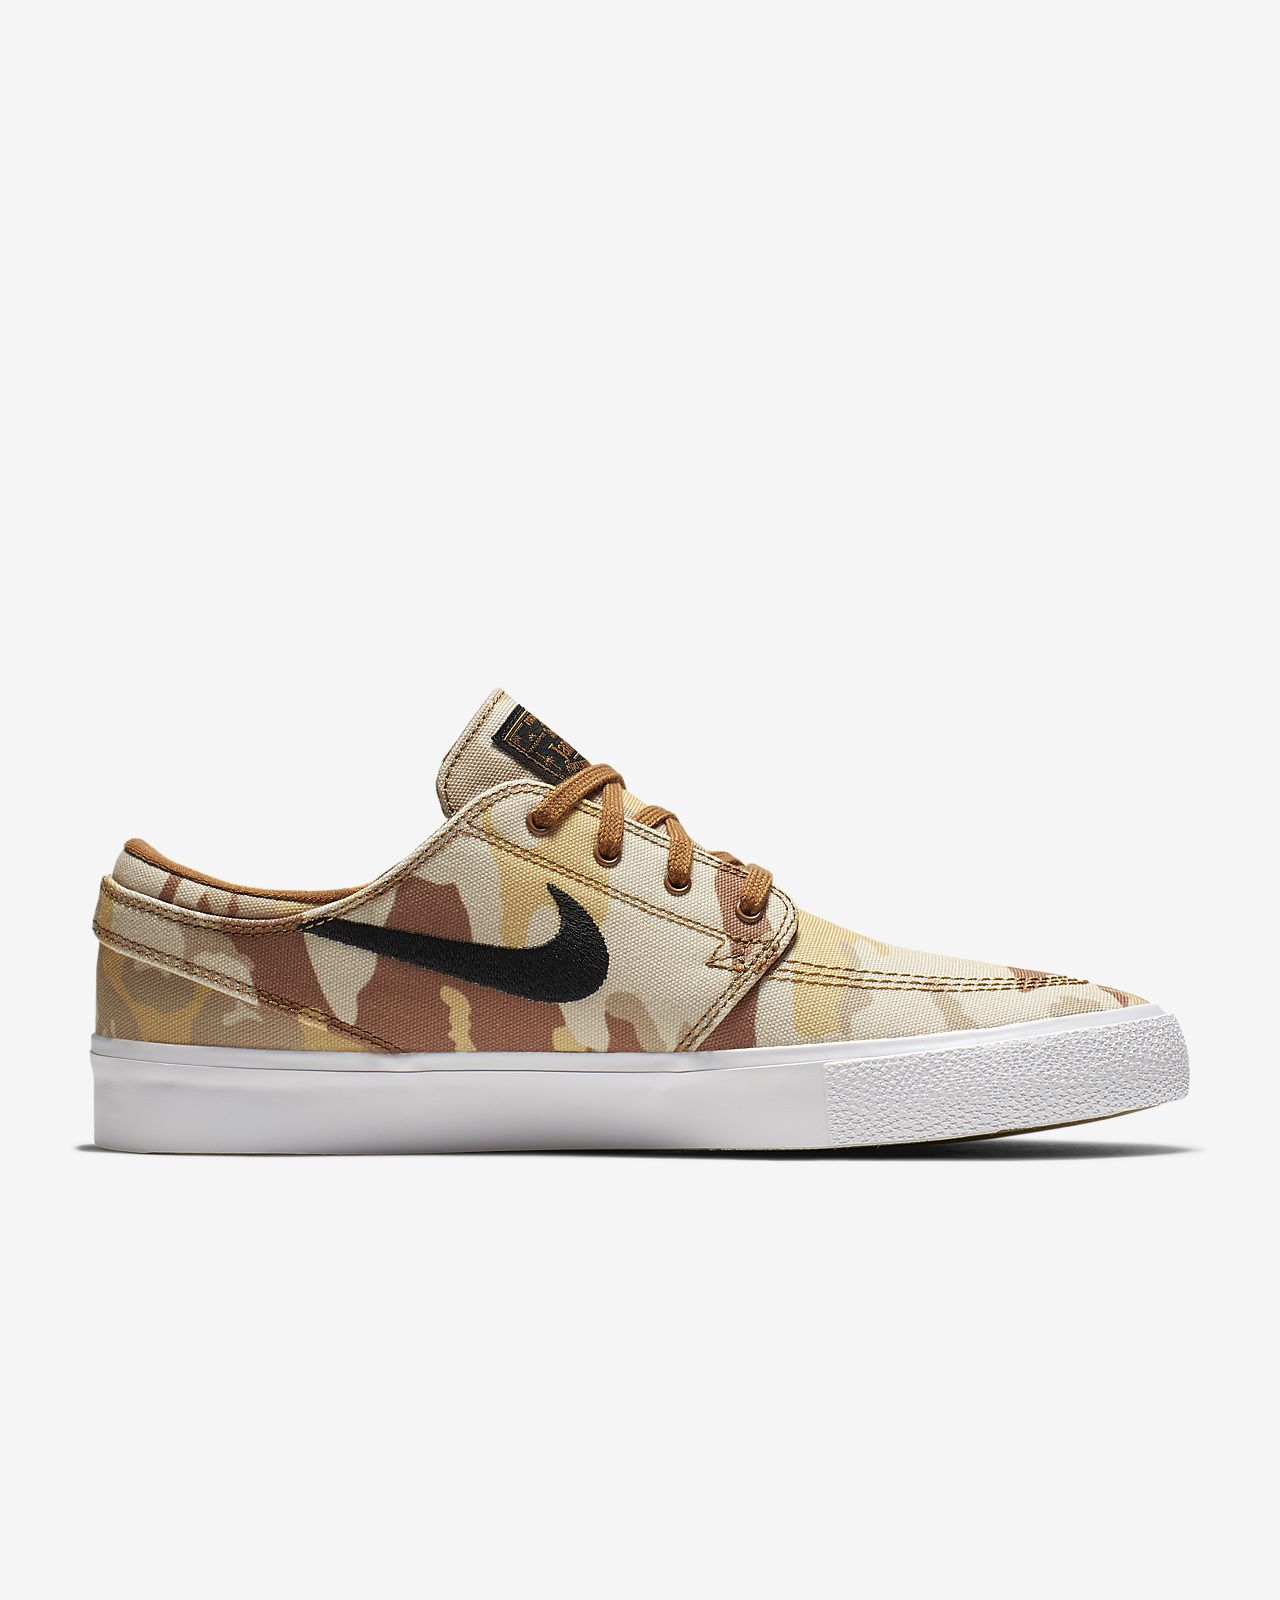 wholesale dealer a1e71 3846e ... Nike SB Zoom Janoski Canvas Premium RM Skate Shoe